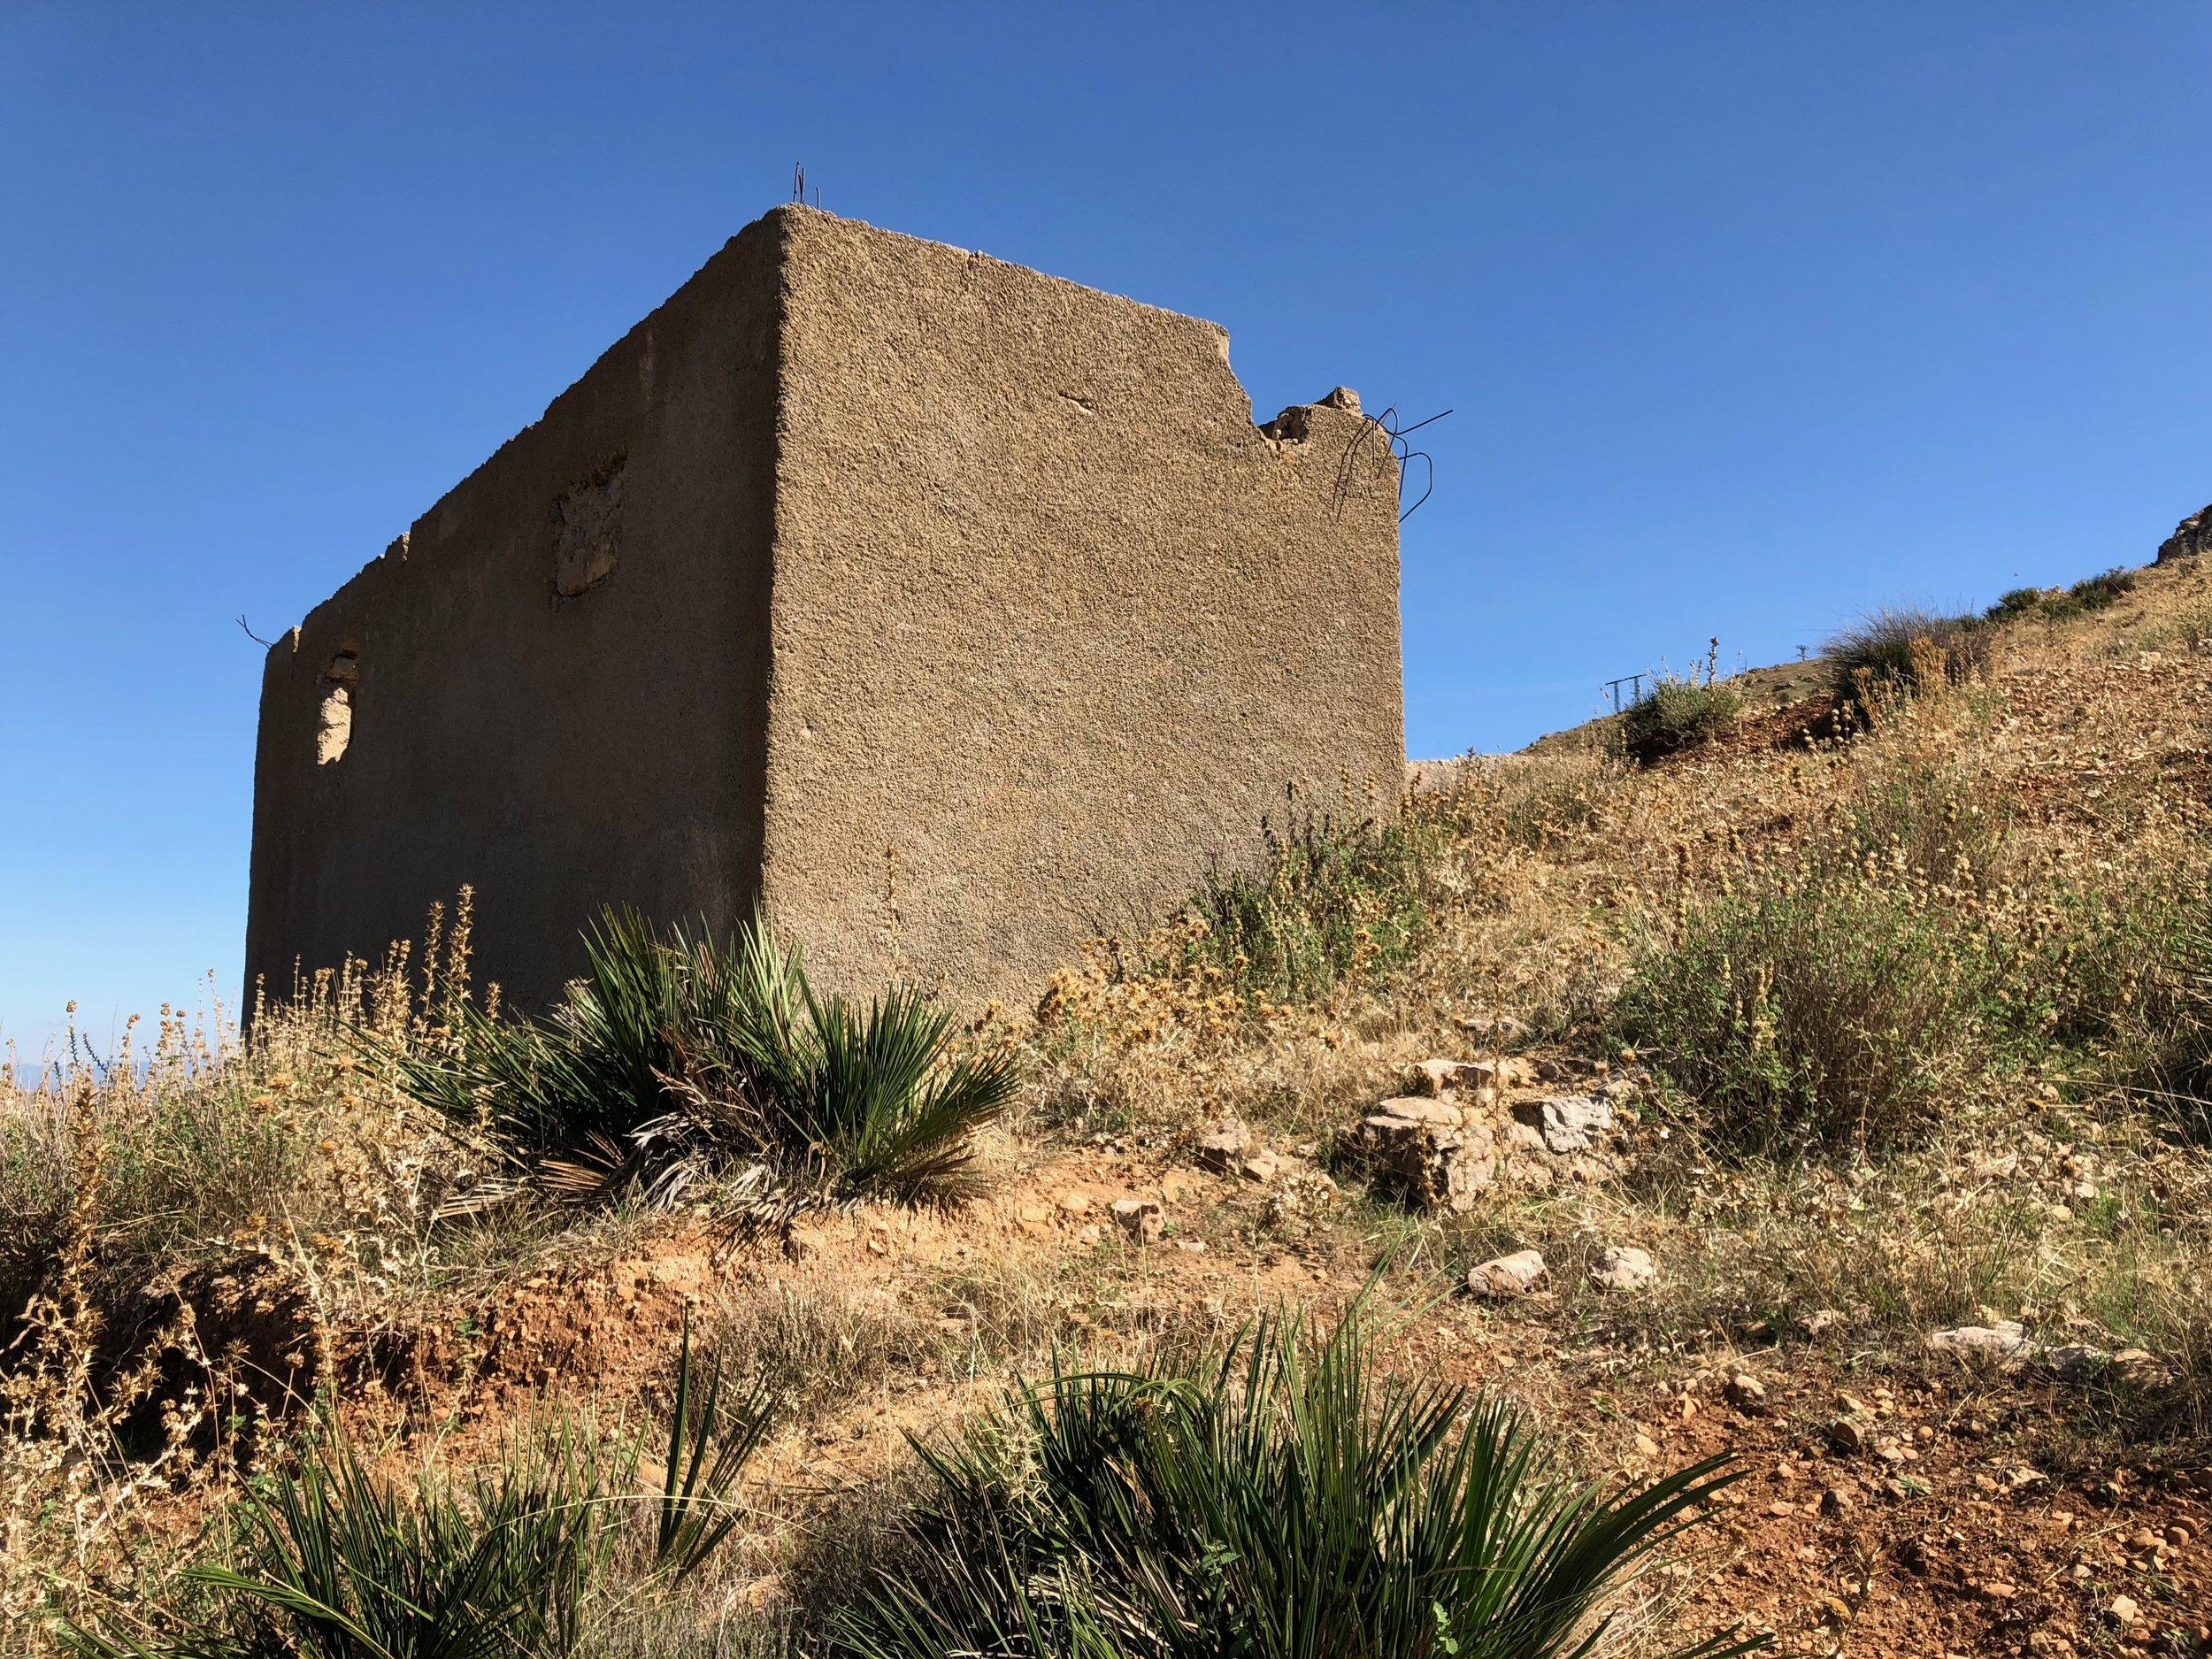 Site for ALTER.ED IV - Sefrou, Fez, Morocco